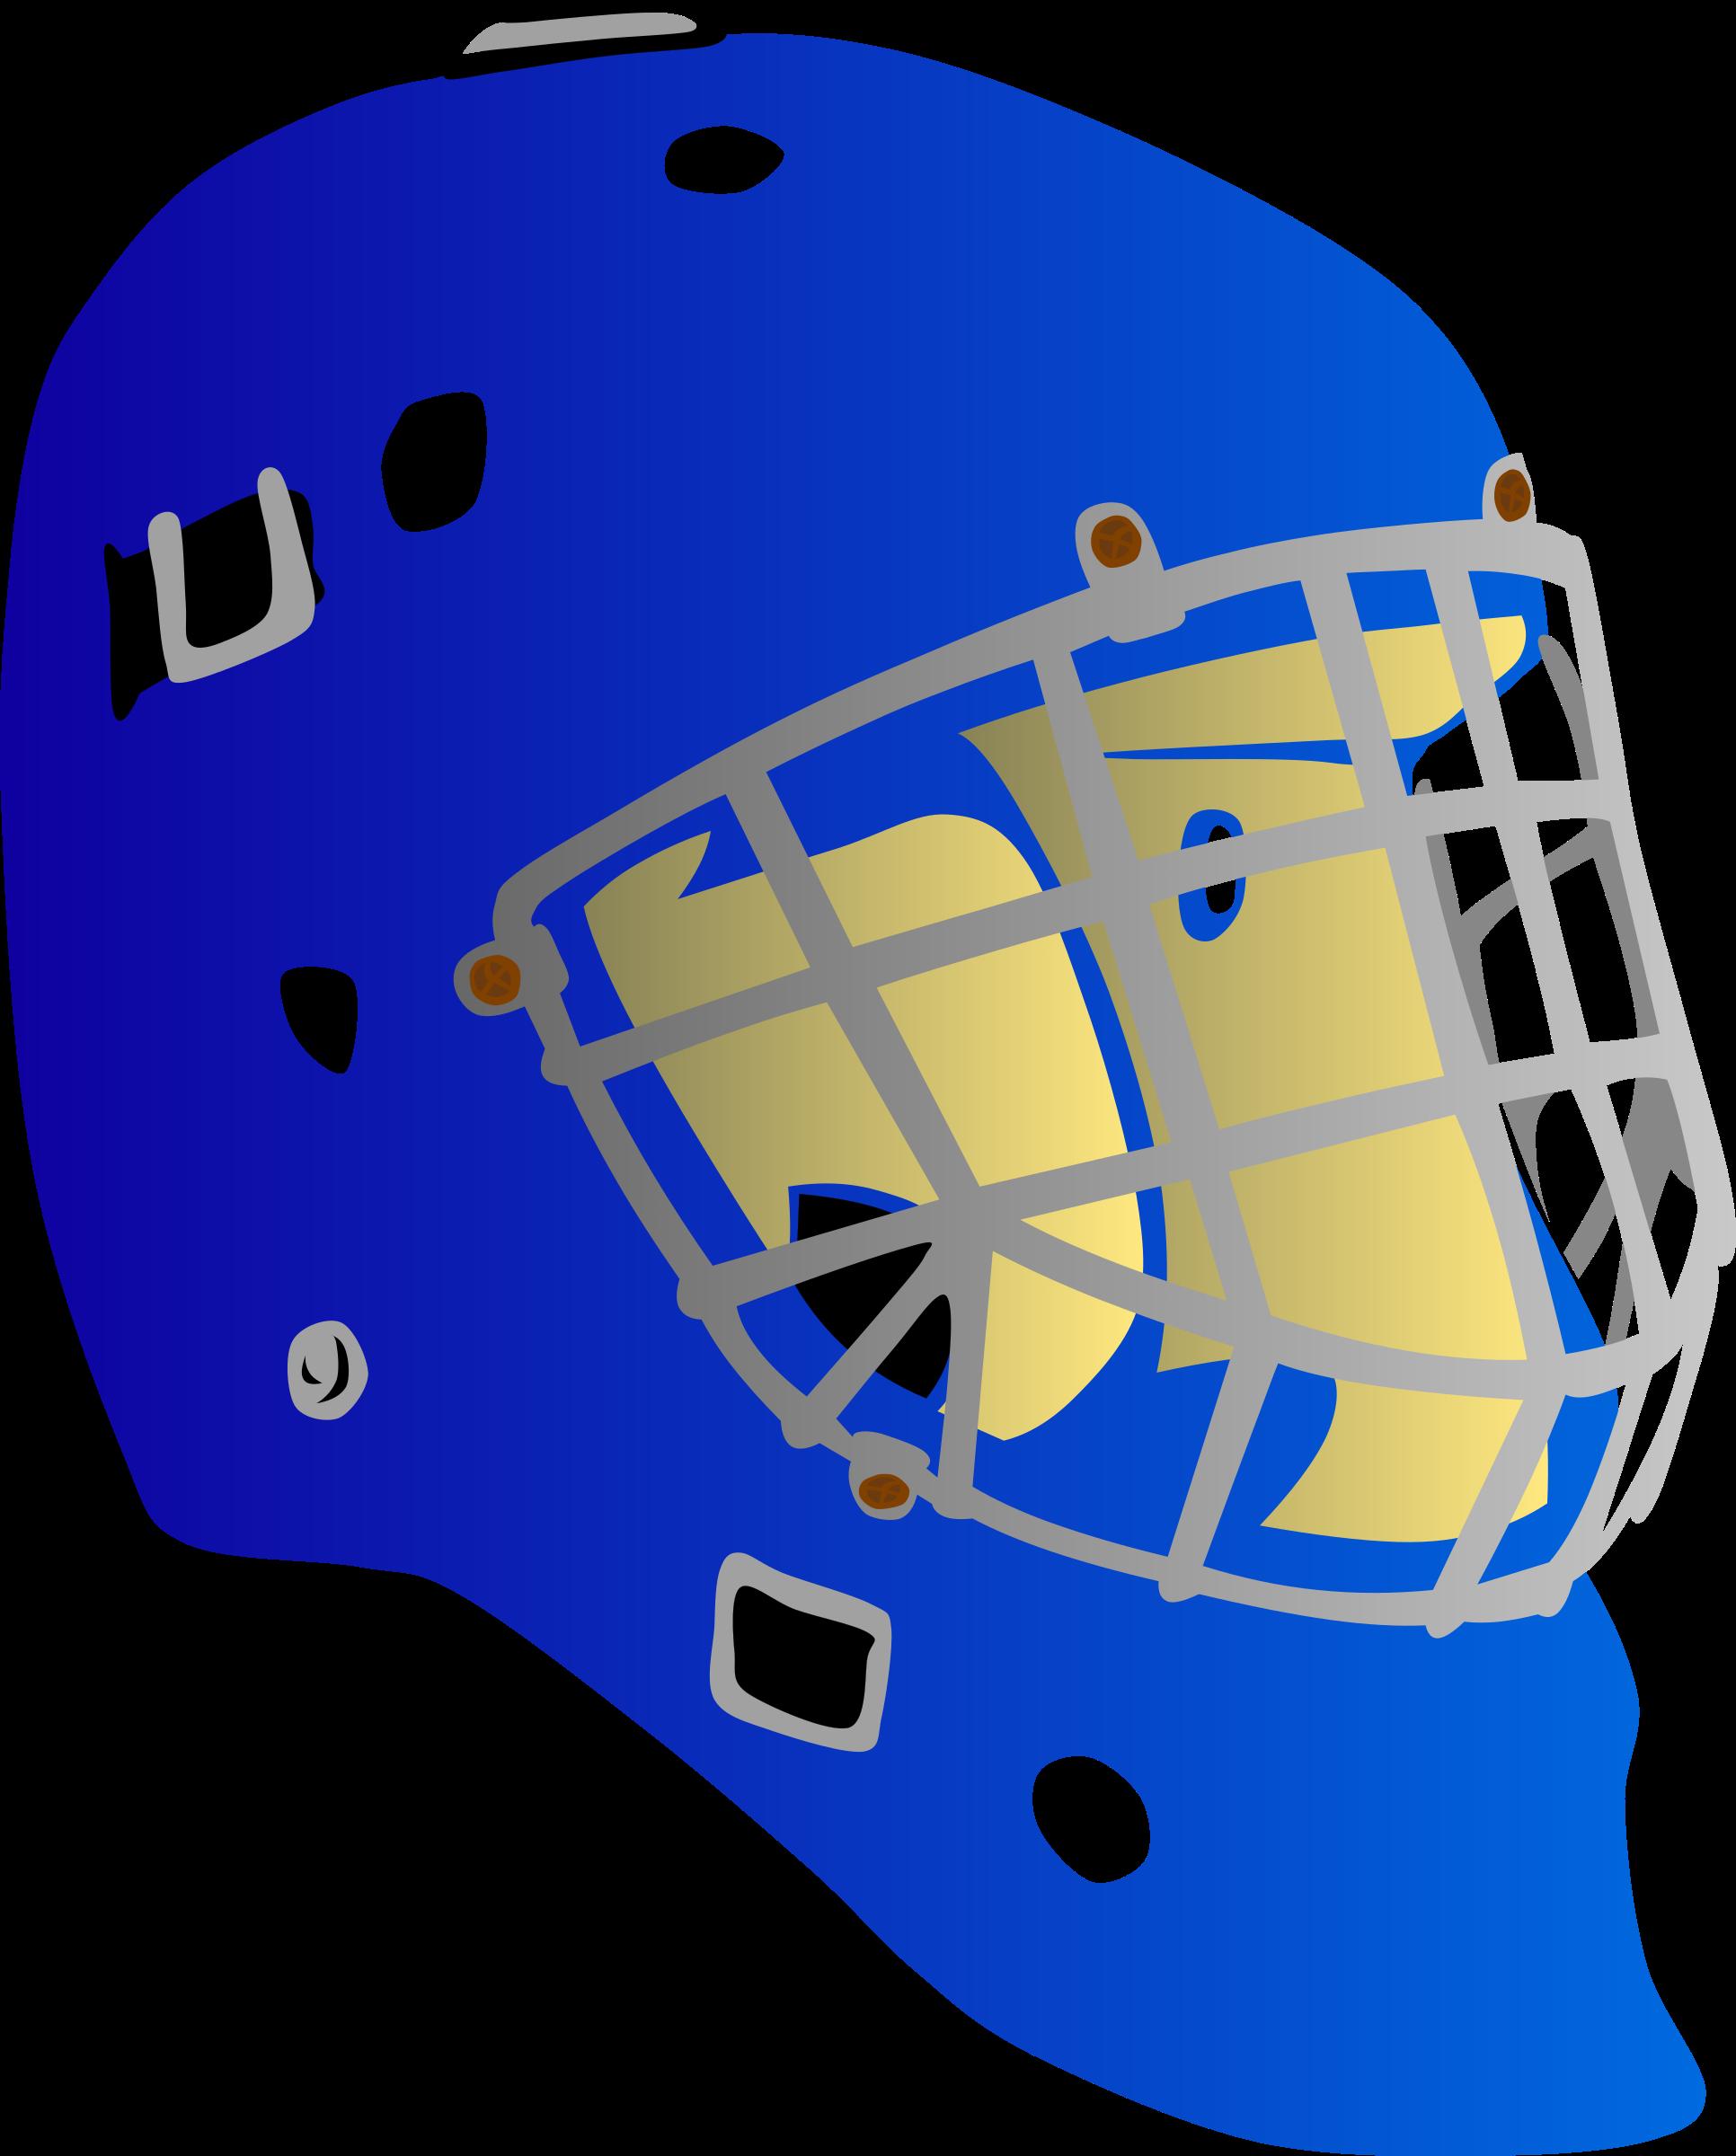 Mask clipart goalie Mask mask Goalie Clipart Goalie